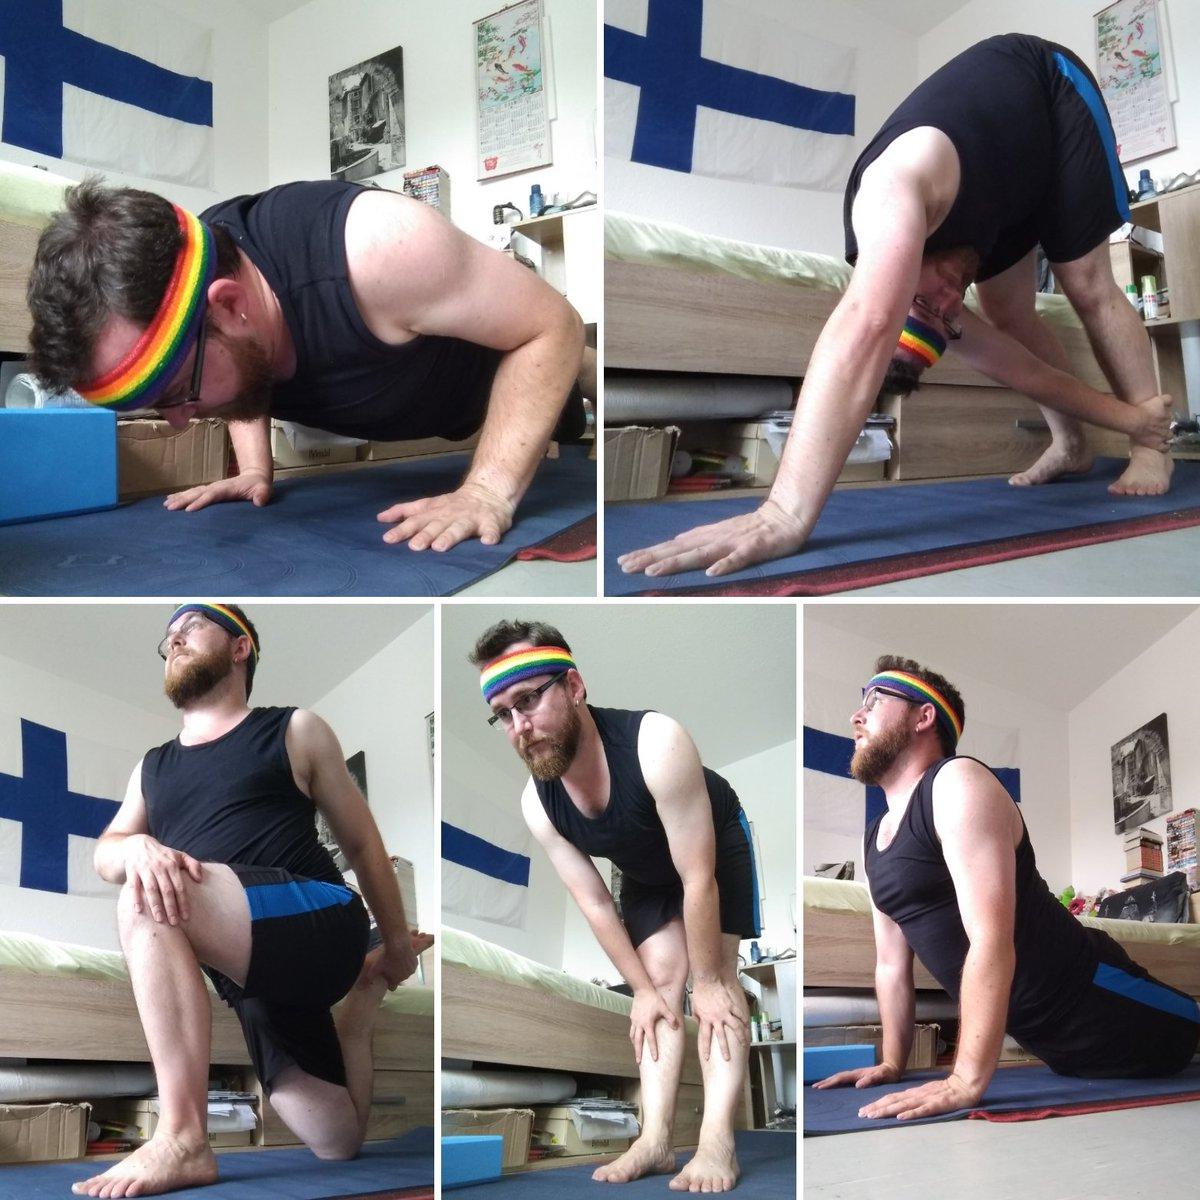 #yoga time with #spiceboy 😁  #summer #rainbow #asana https://t.co/9xanB0QioW